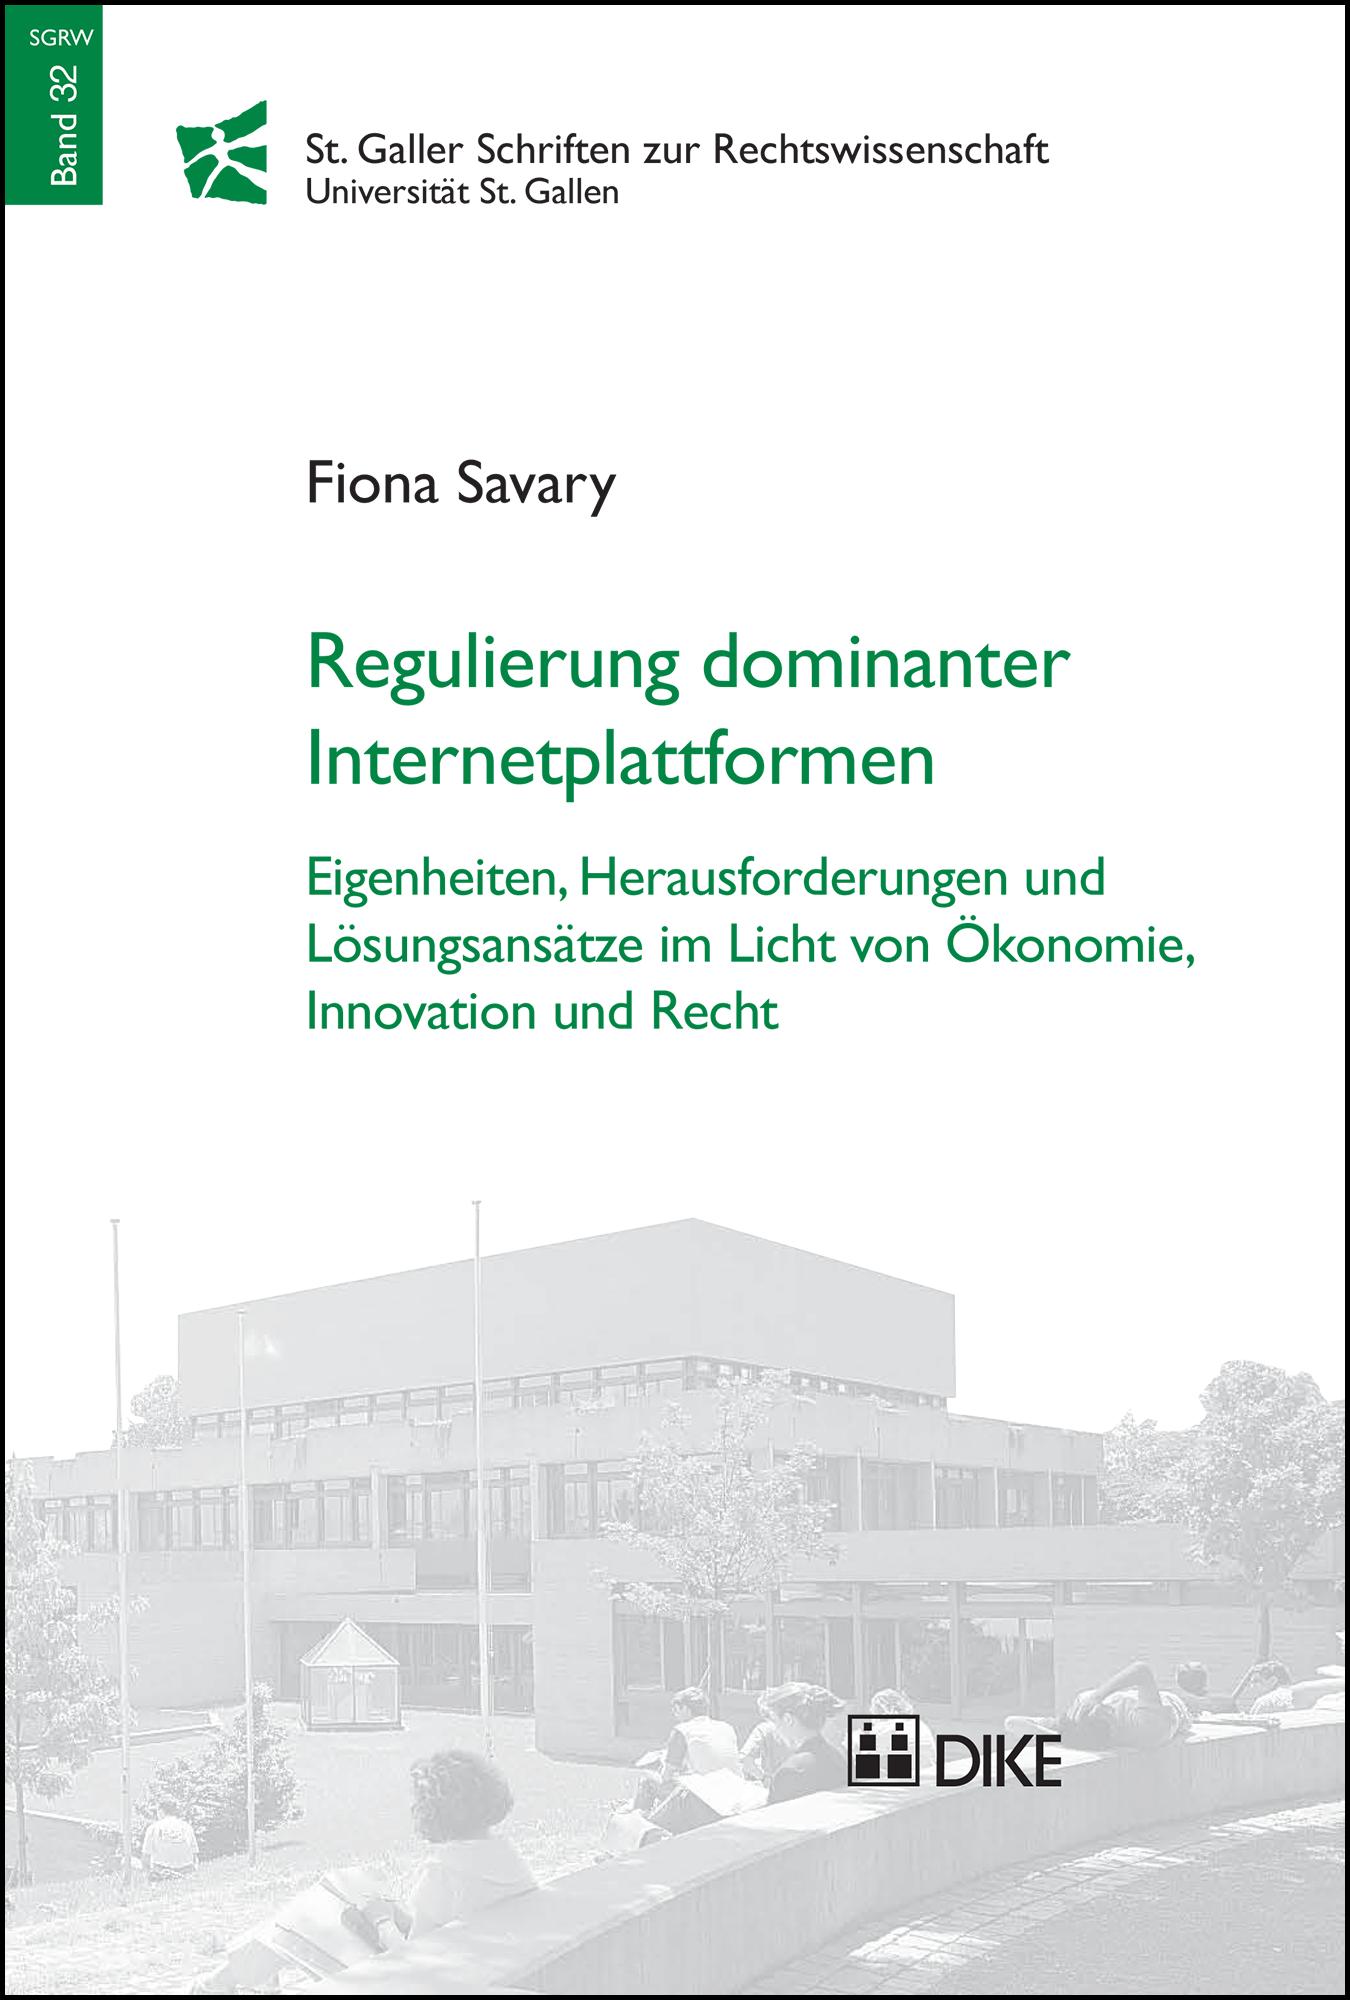 Regulierung dominanter Internetplattformen